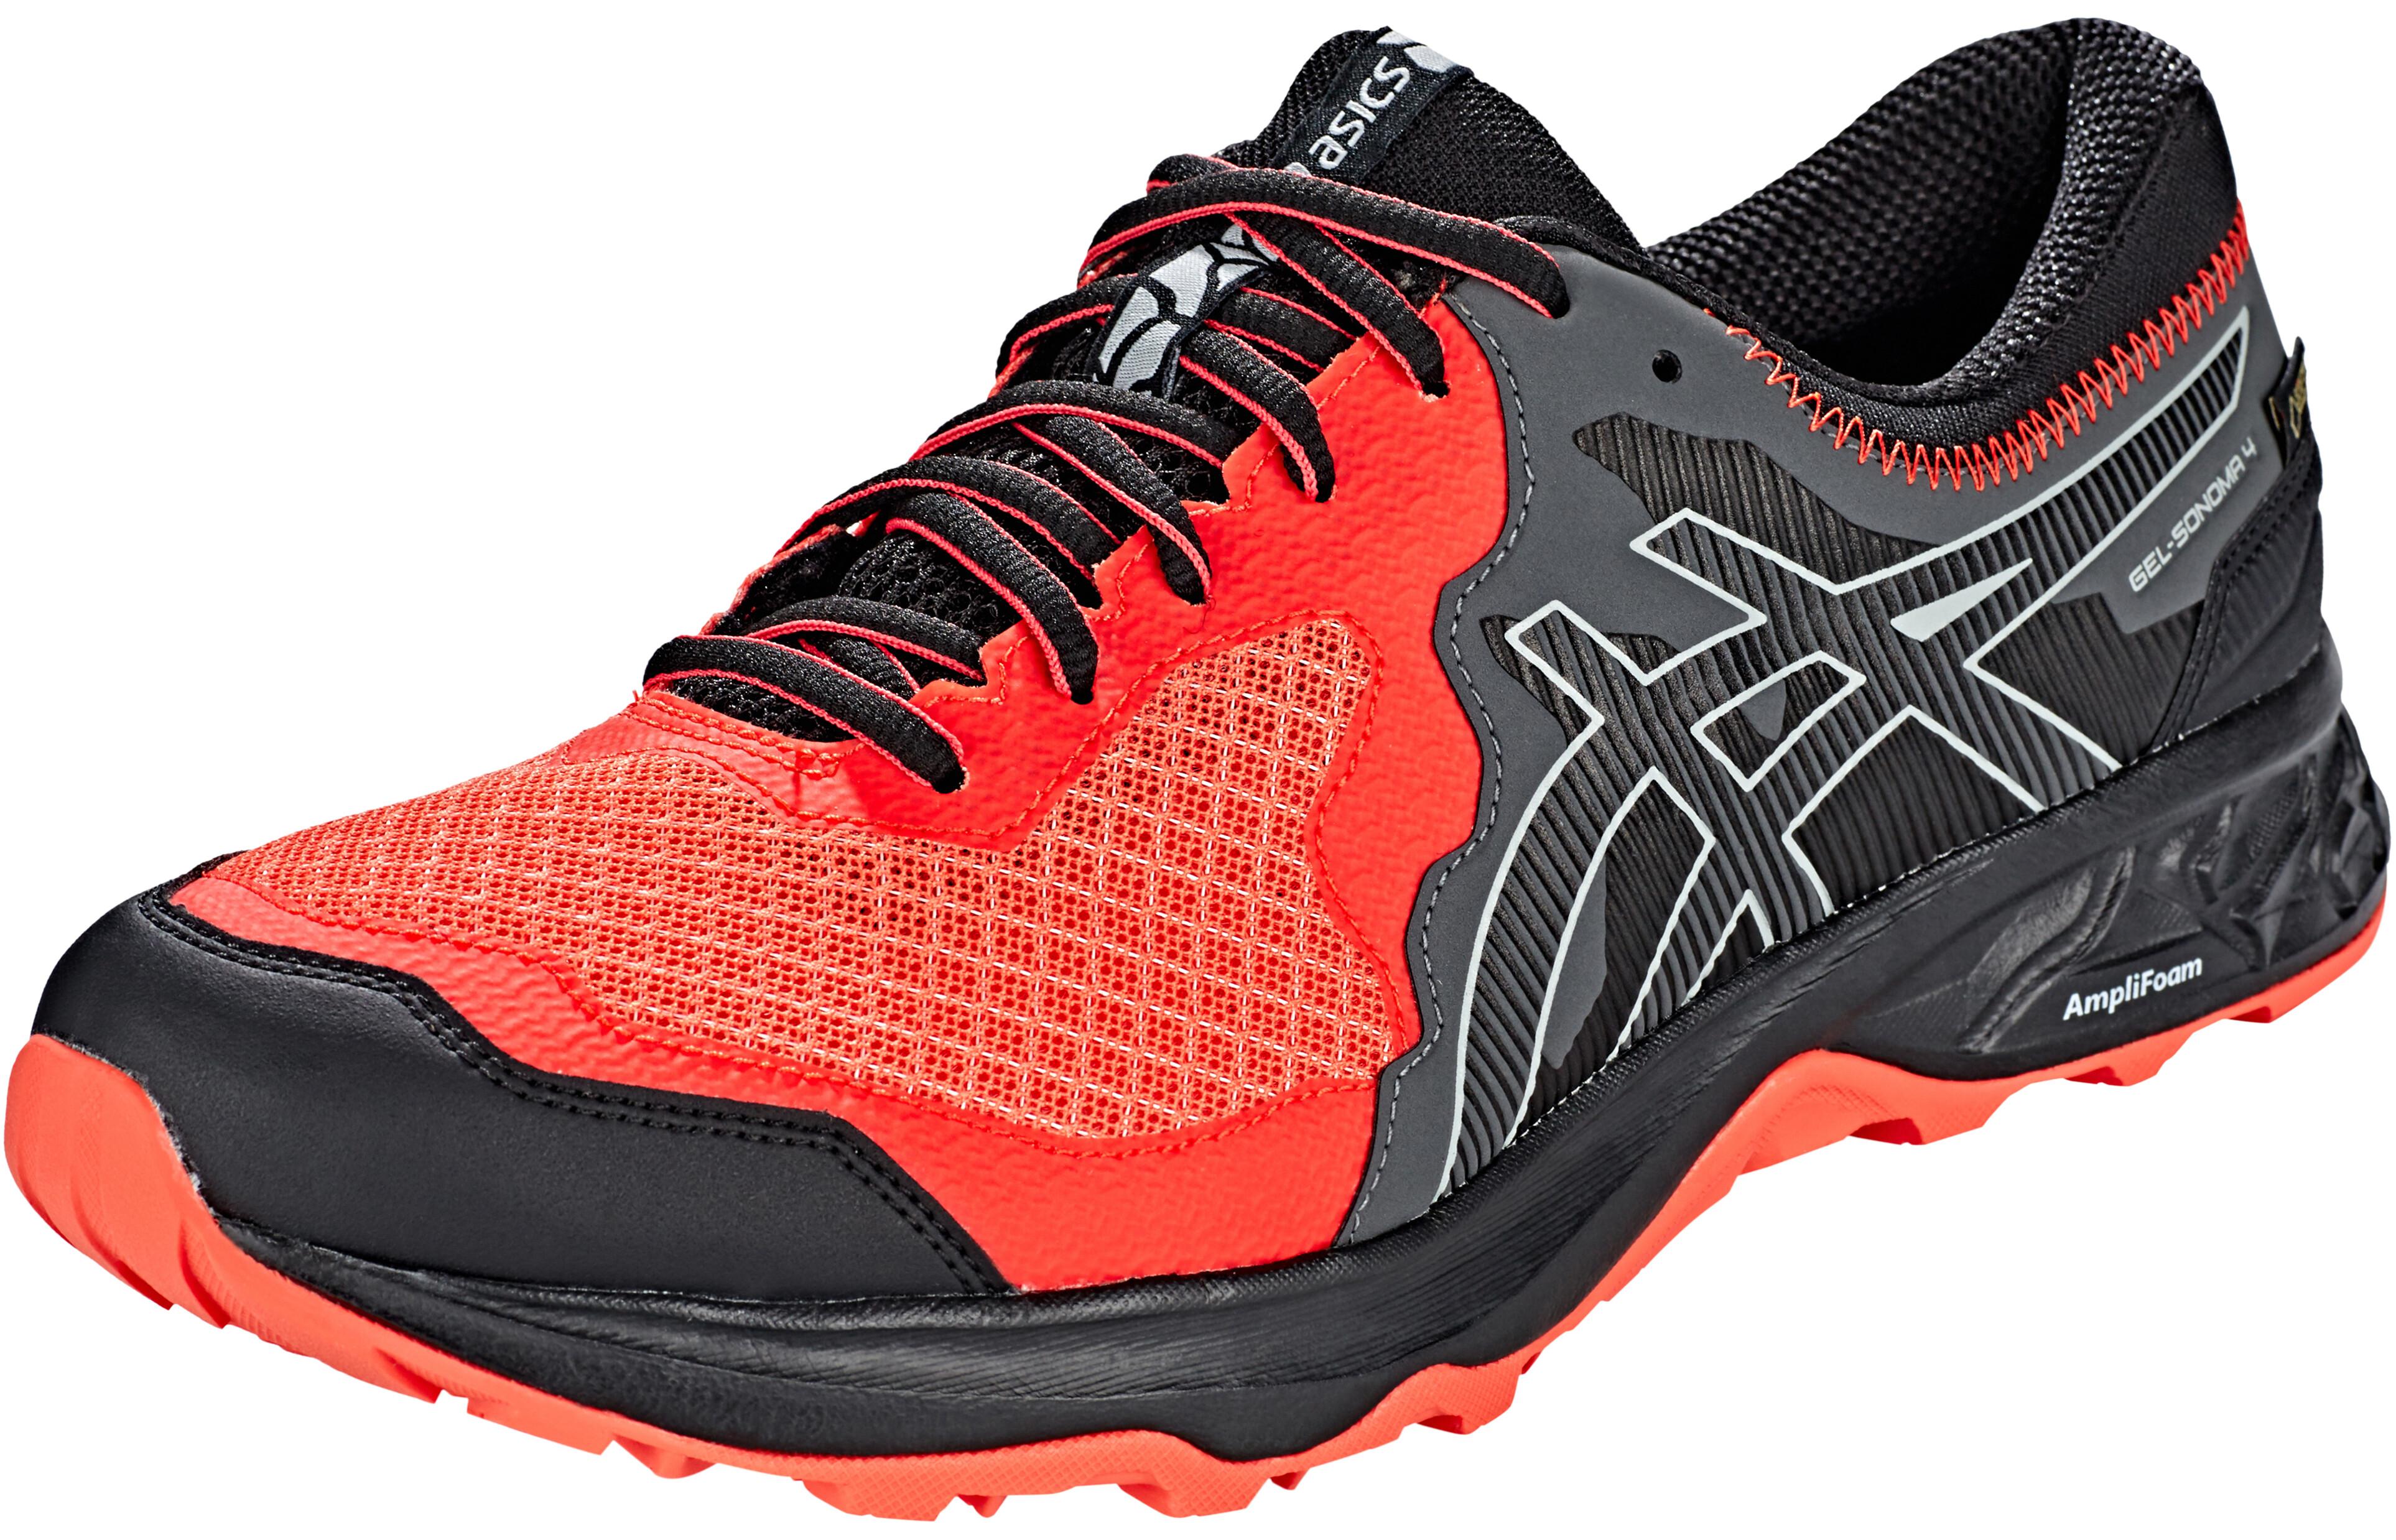 0bfe4e38150 asics Gel-Sonoma 4 G-TX Shoes Men Red Snapper Black